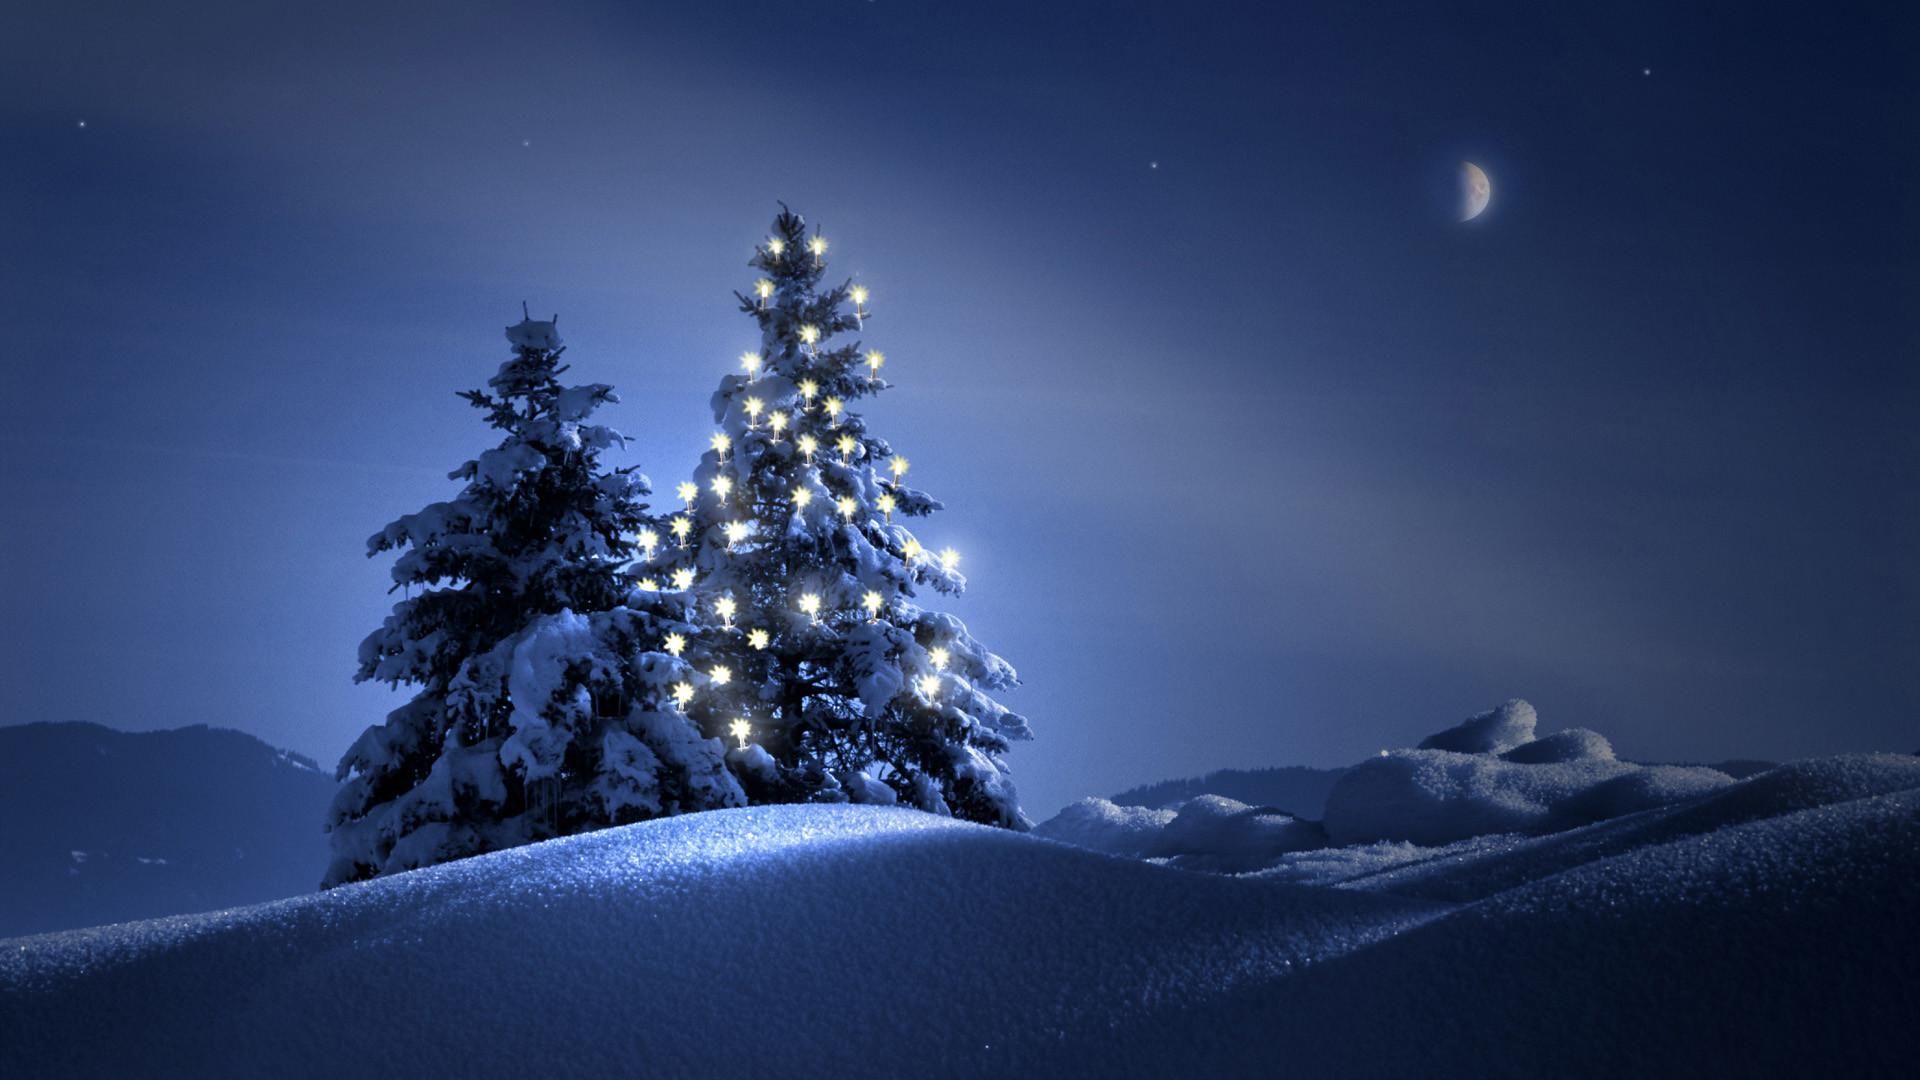 1920x1080 Beautiful Winter Landscapes Amazing Scenery Pinterest